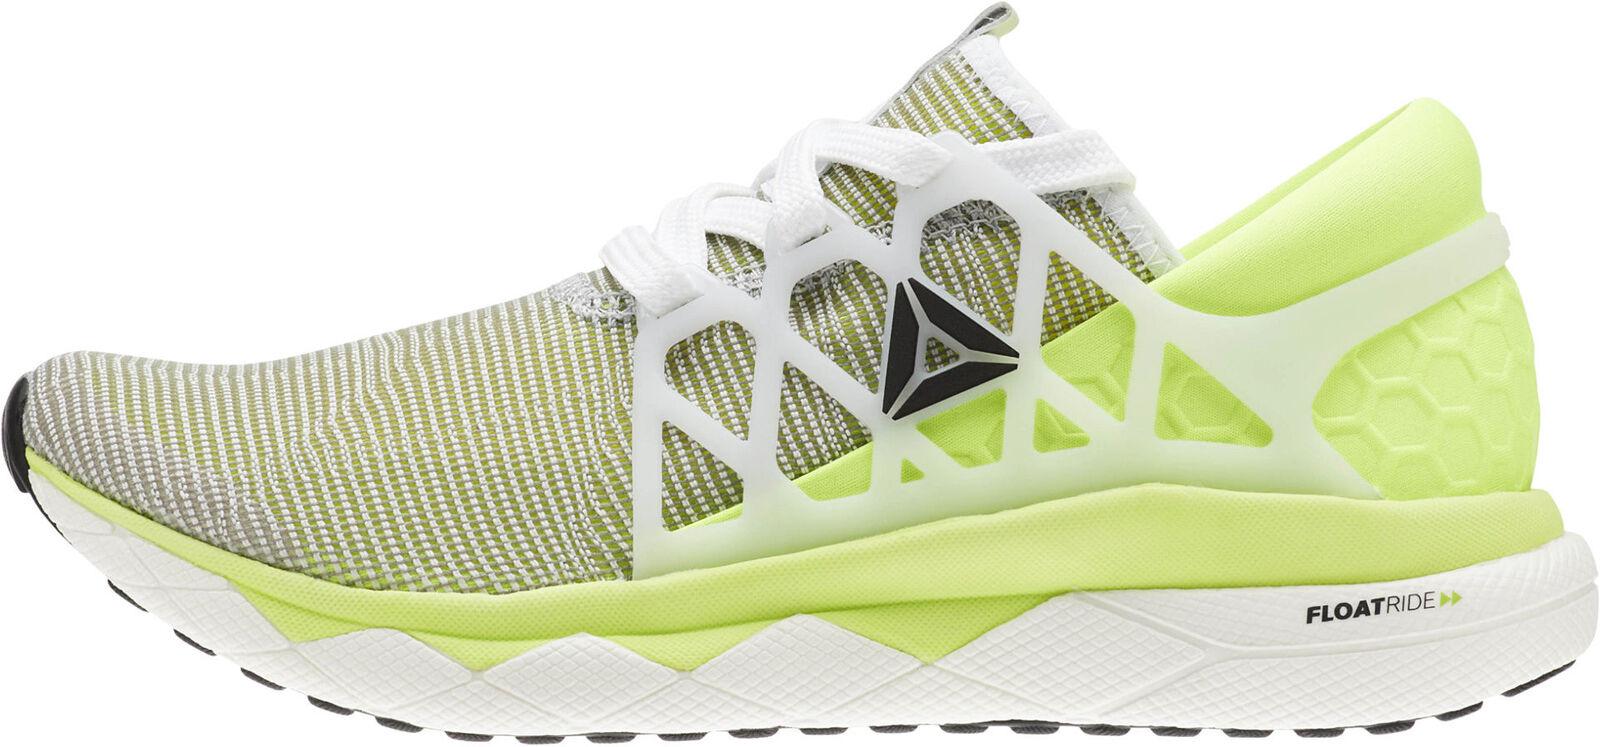 Reebok Floatride Run Flexweave Womens Running shoes - White